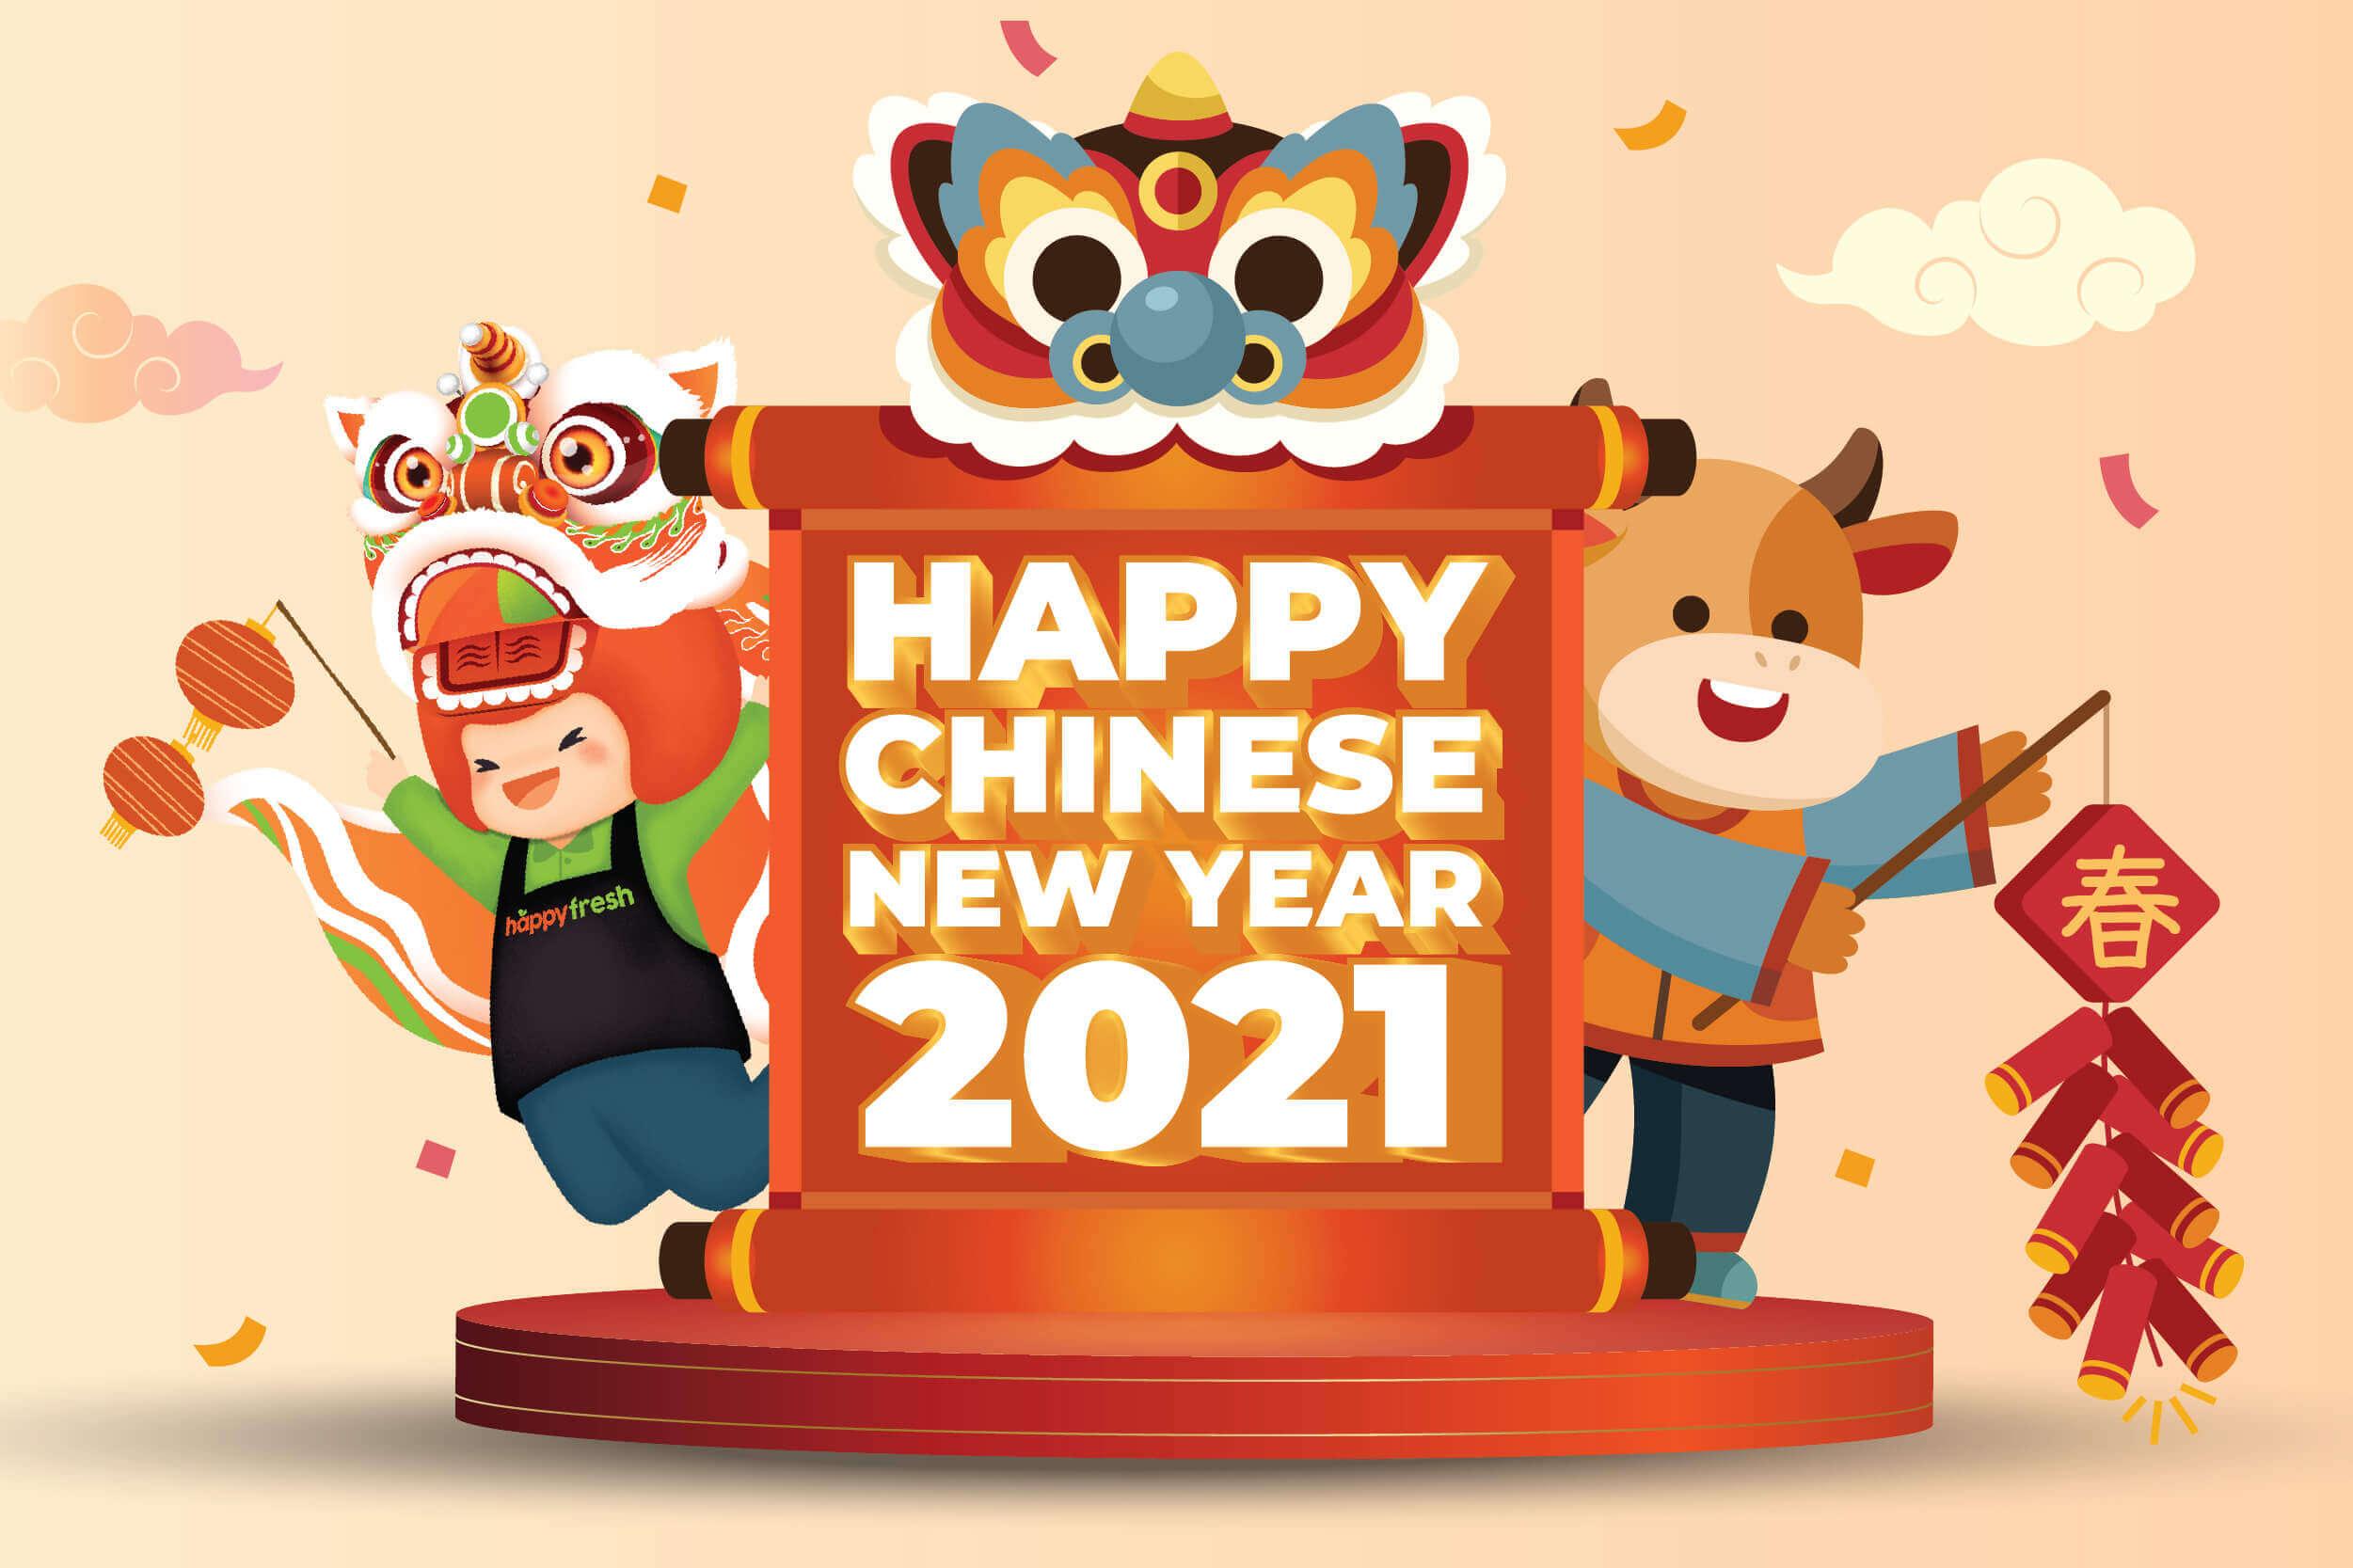 CNY 2021